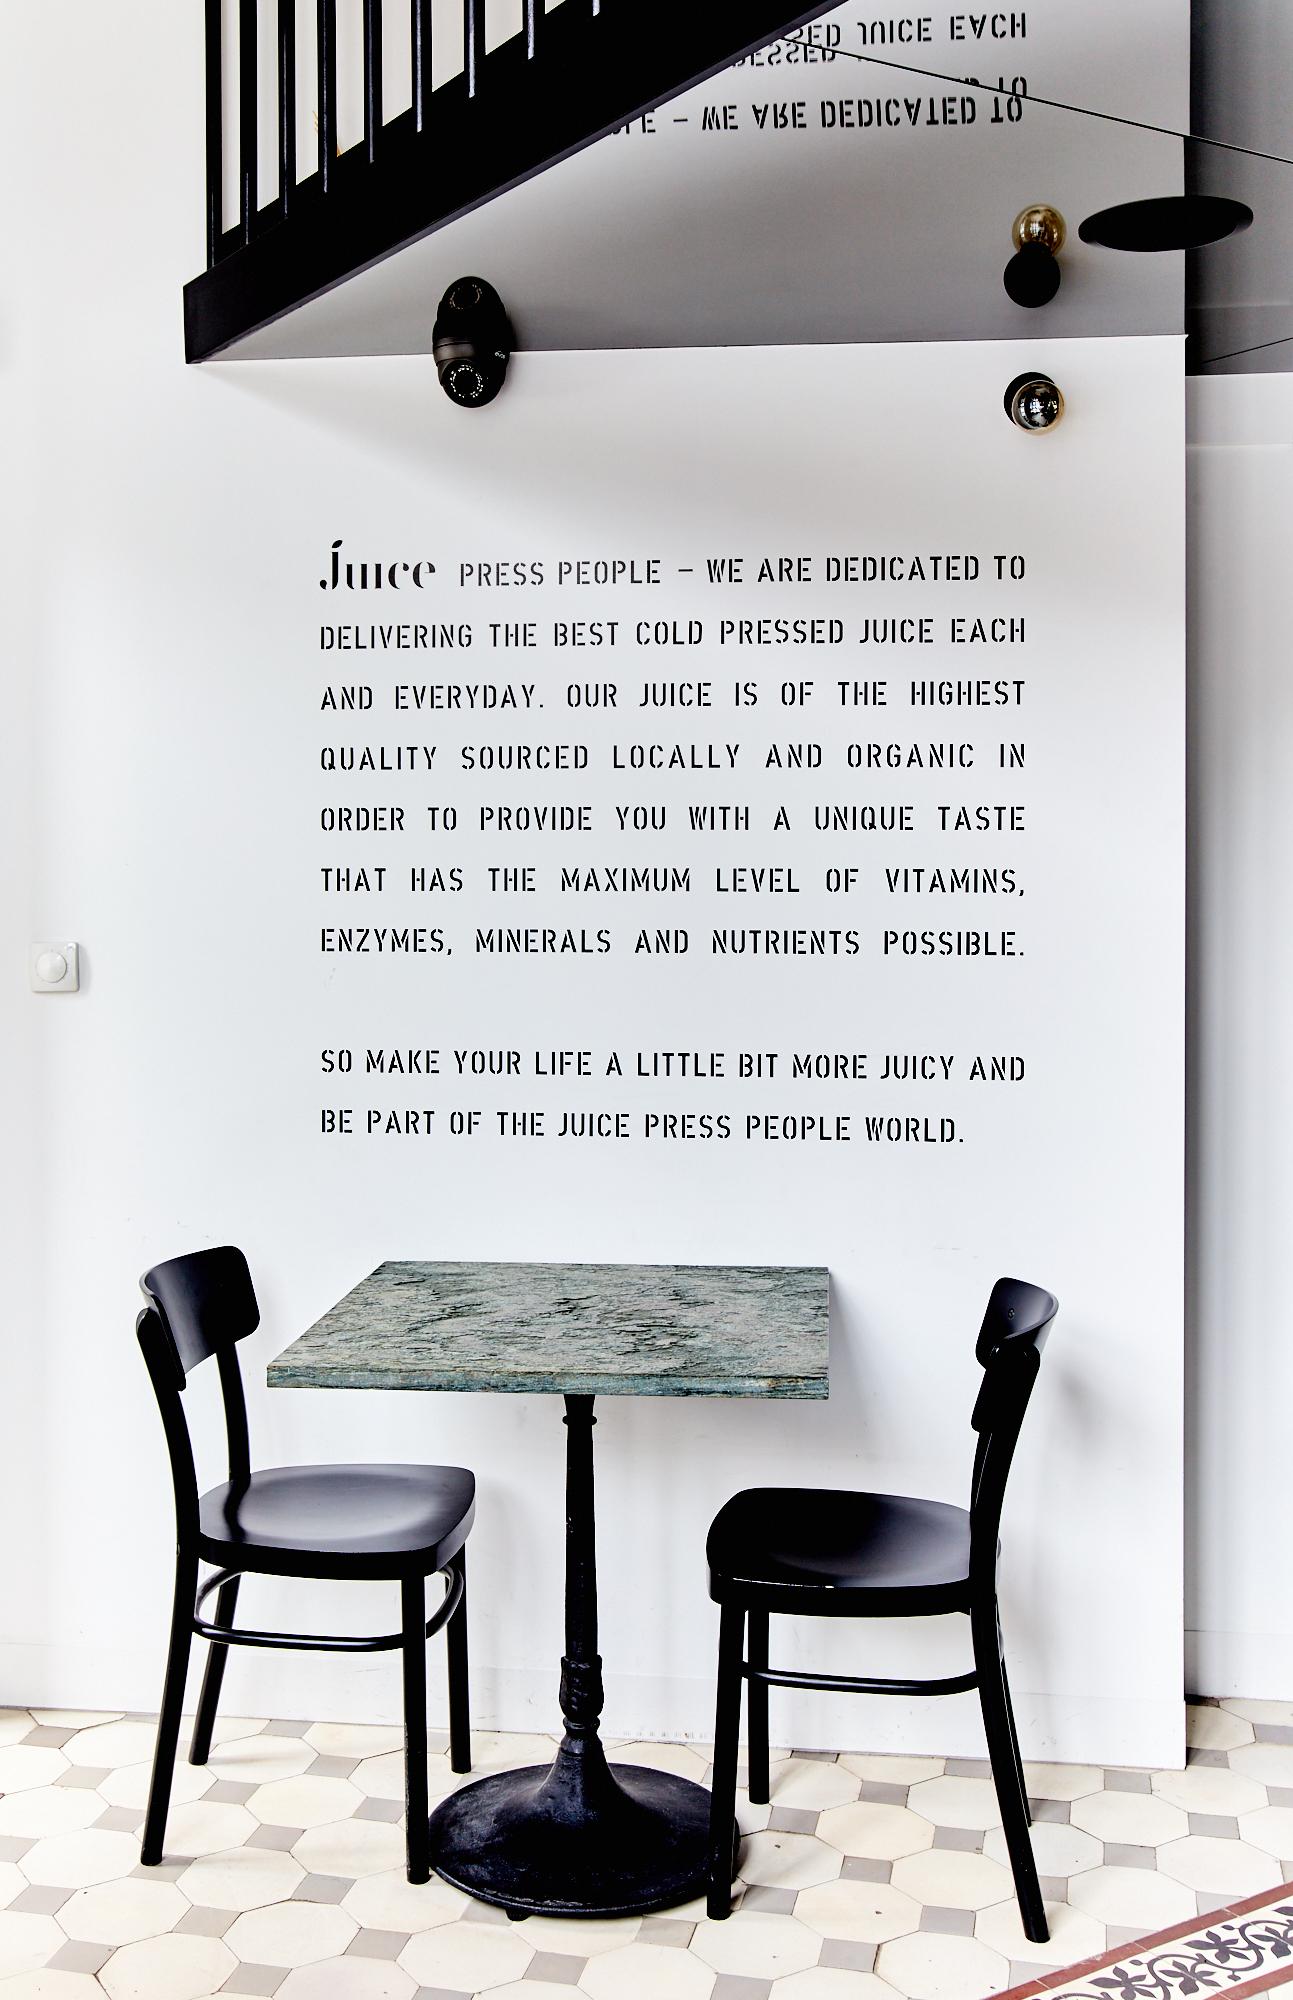 Juice press people